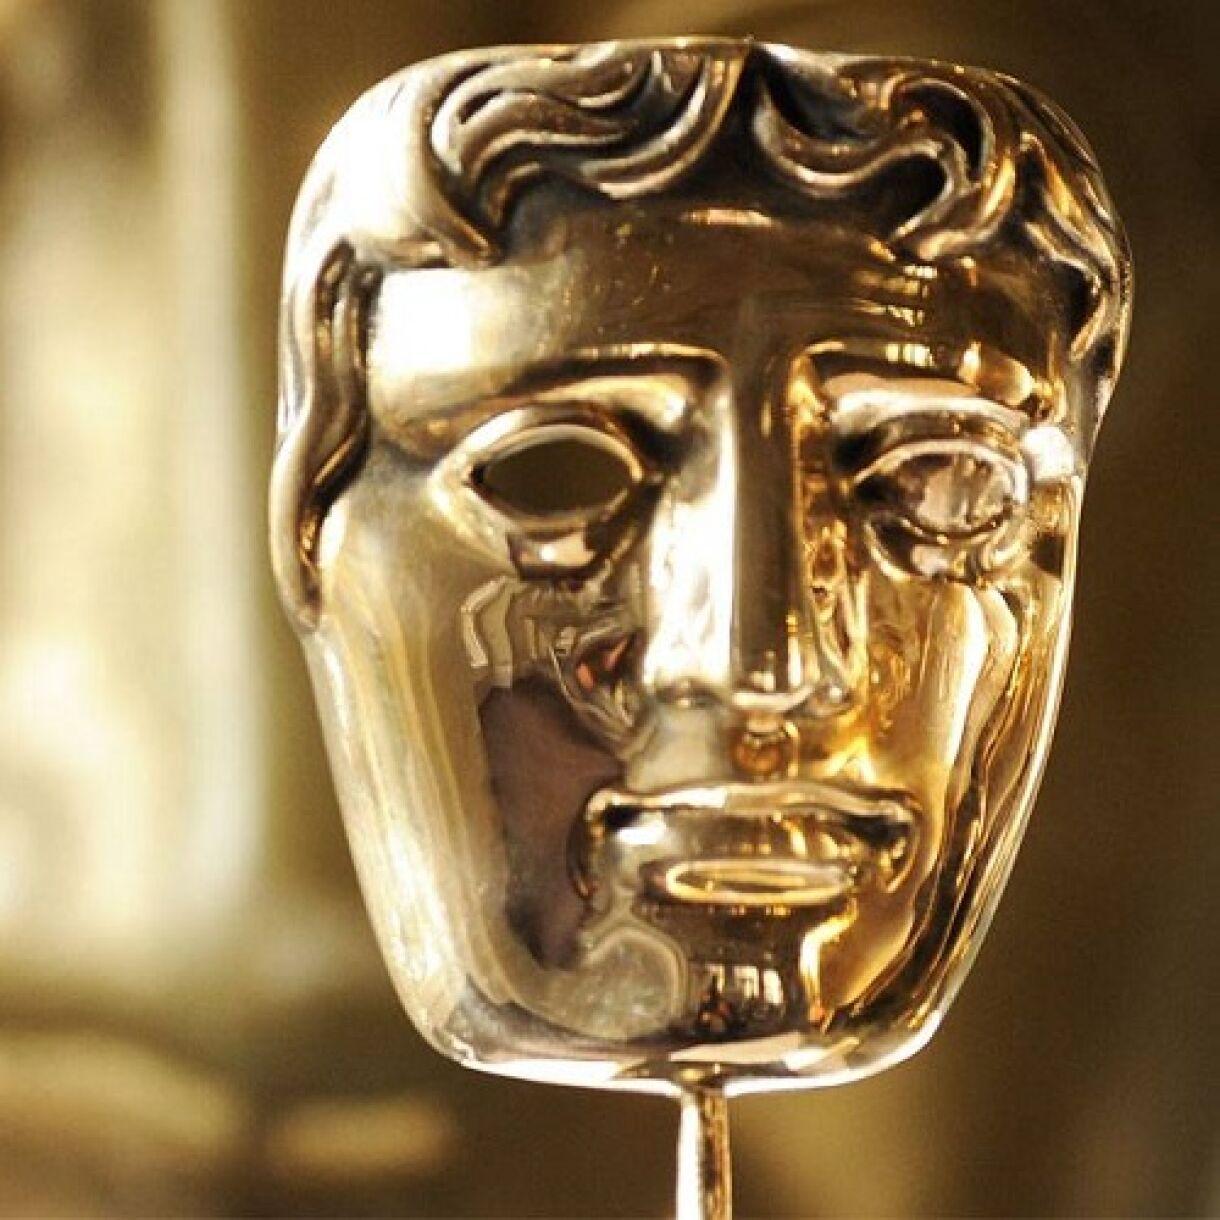 BAFTA Games Awards nominees announced